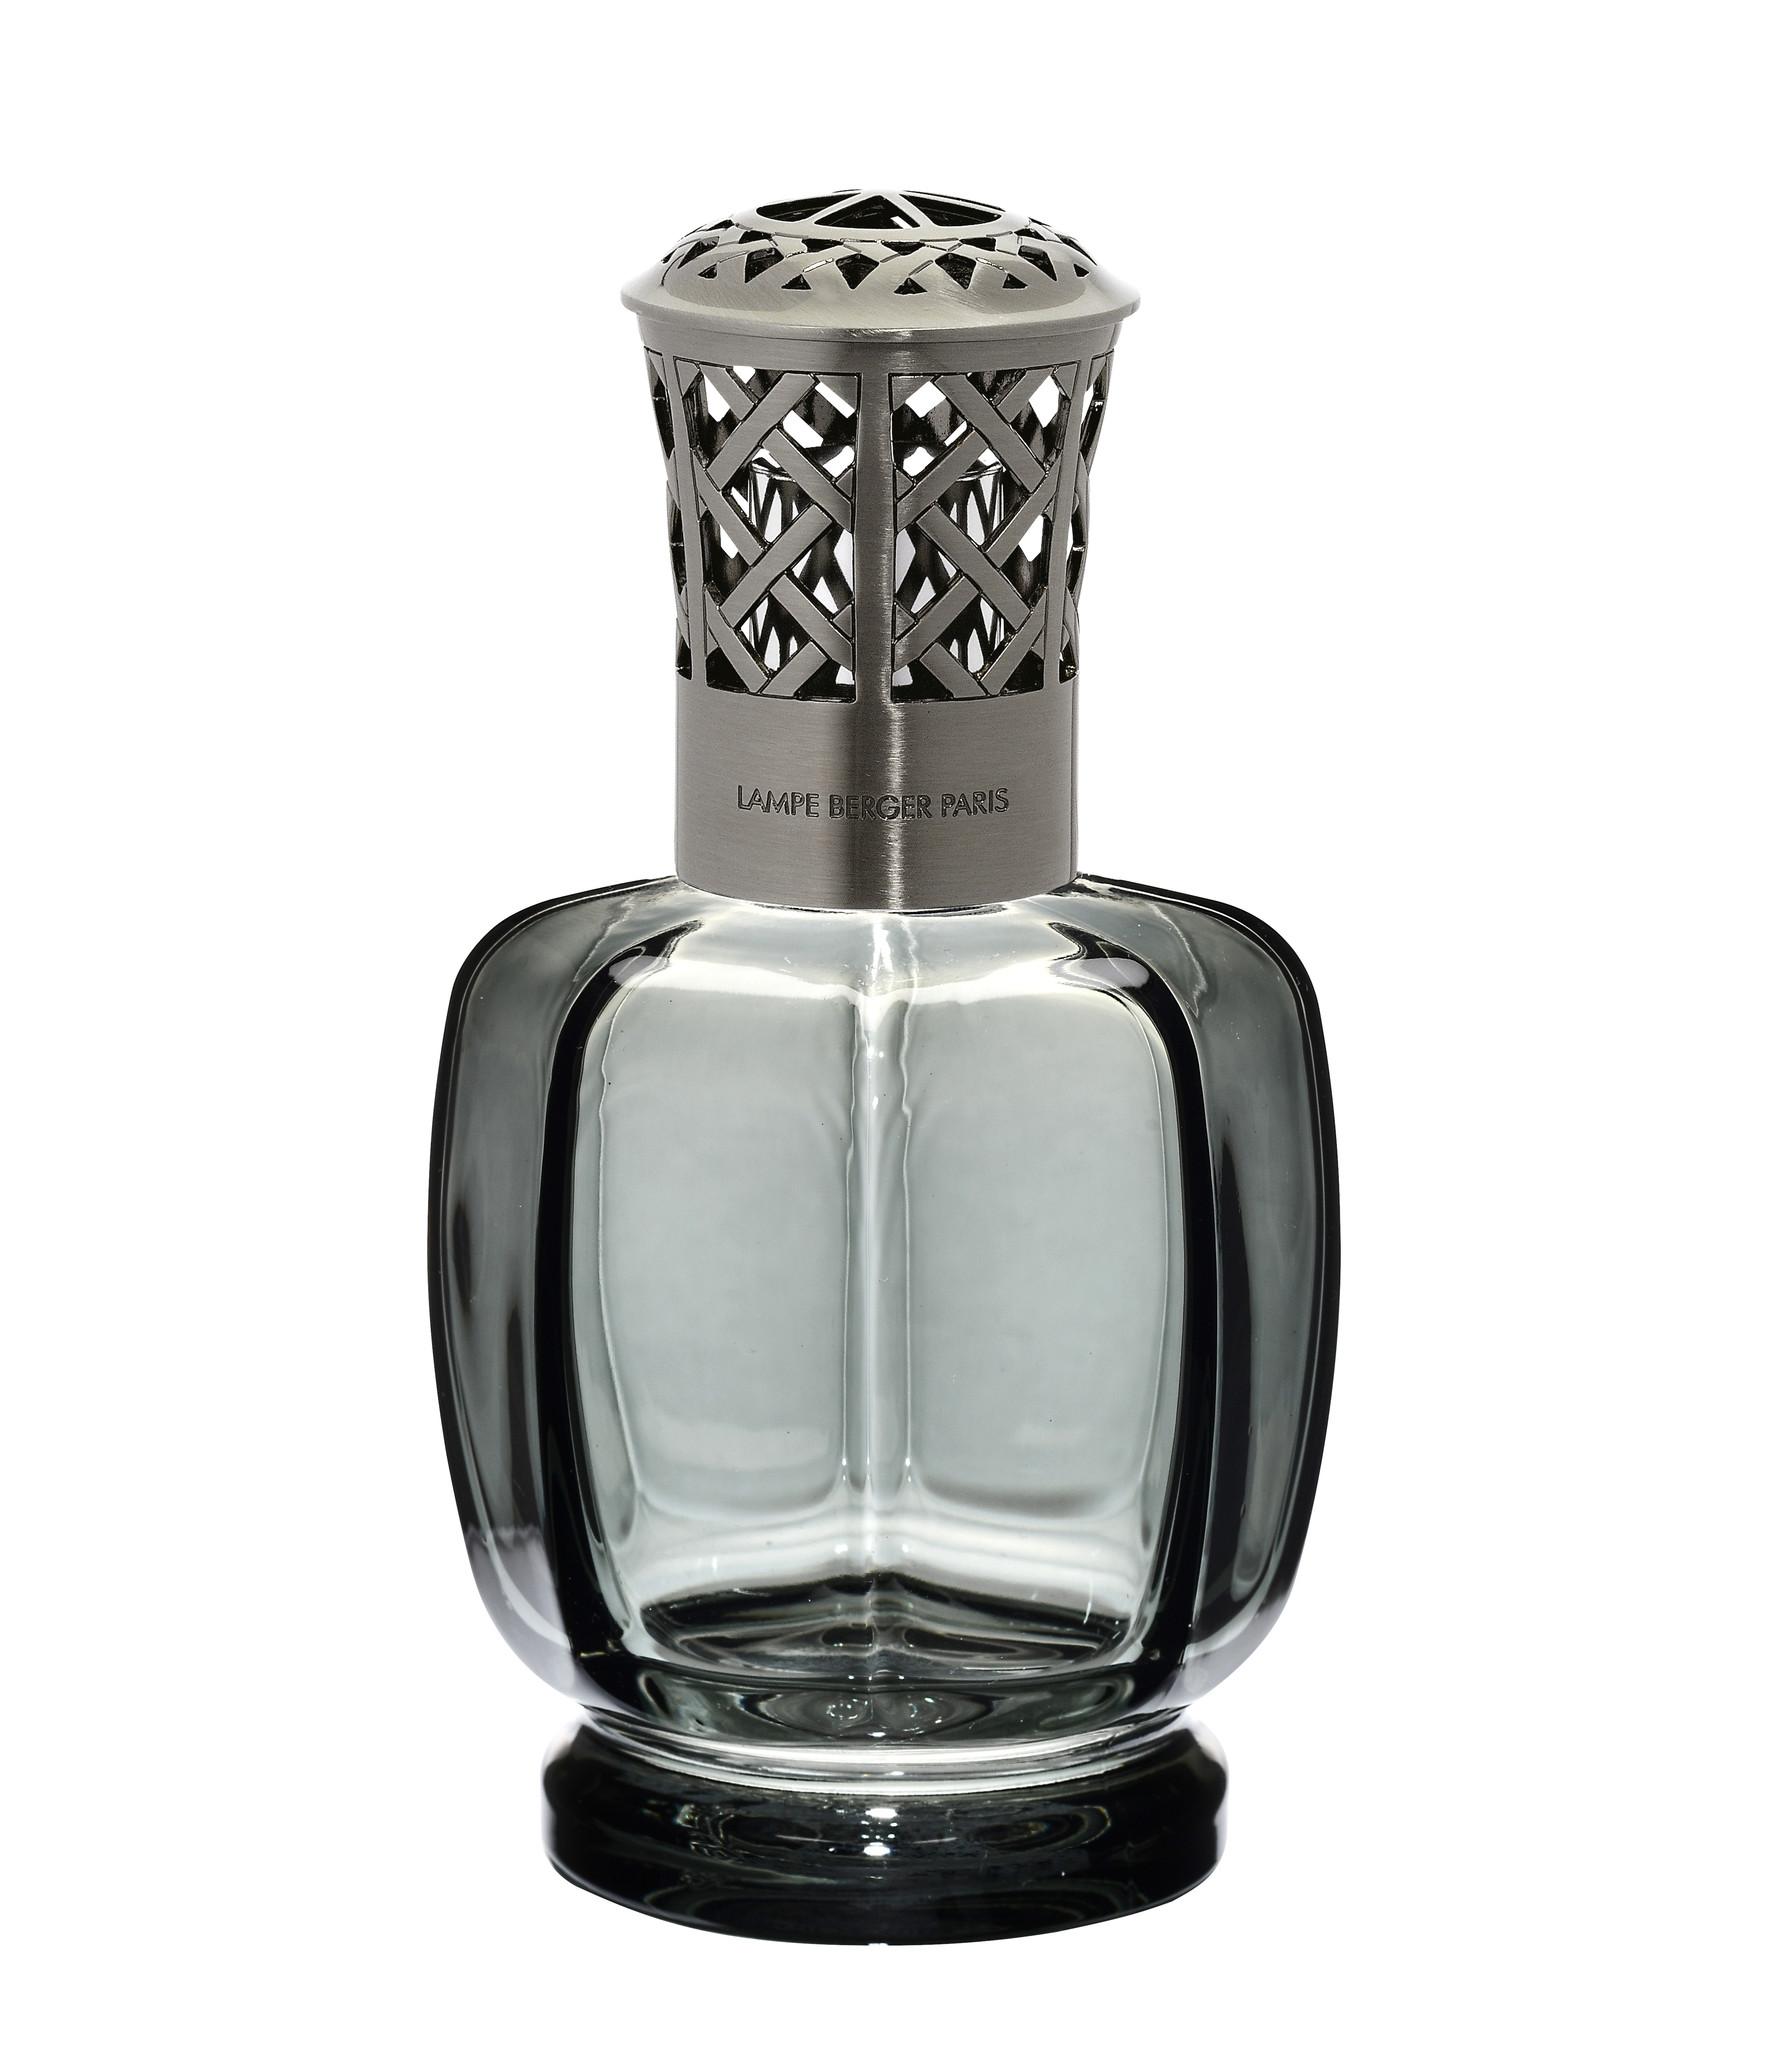 Parfumverspreider Belle Epoque Grise & 200ml Tentation Santal